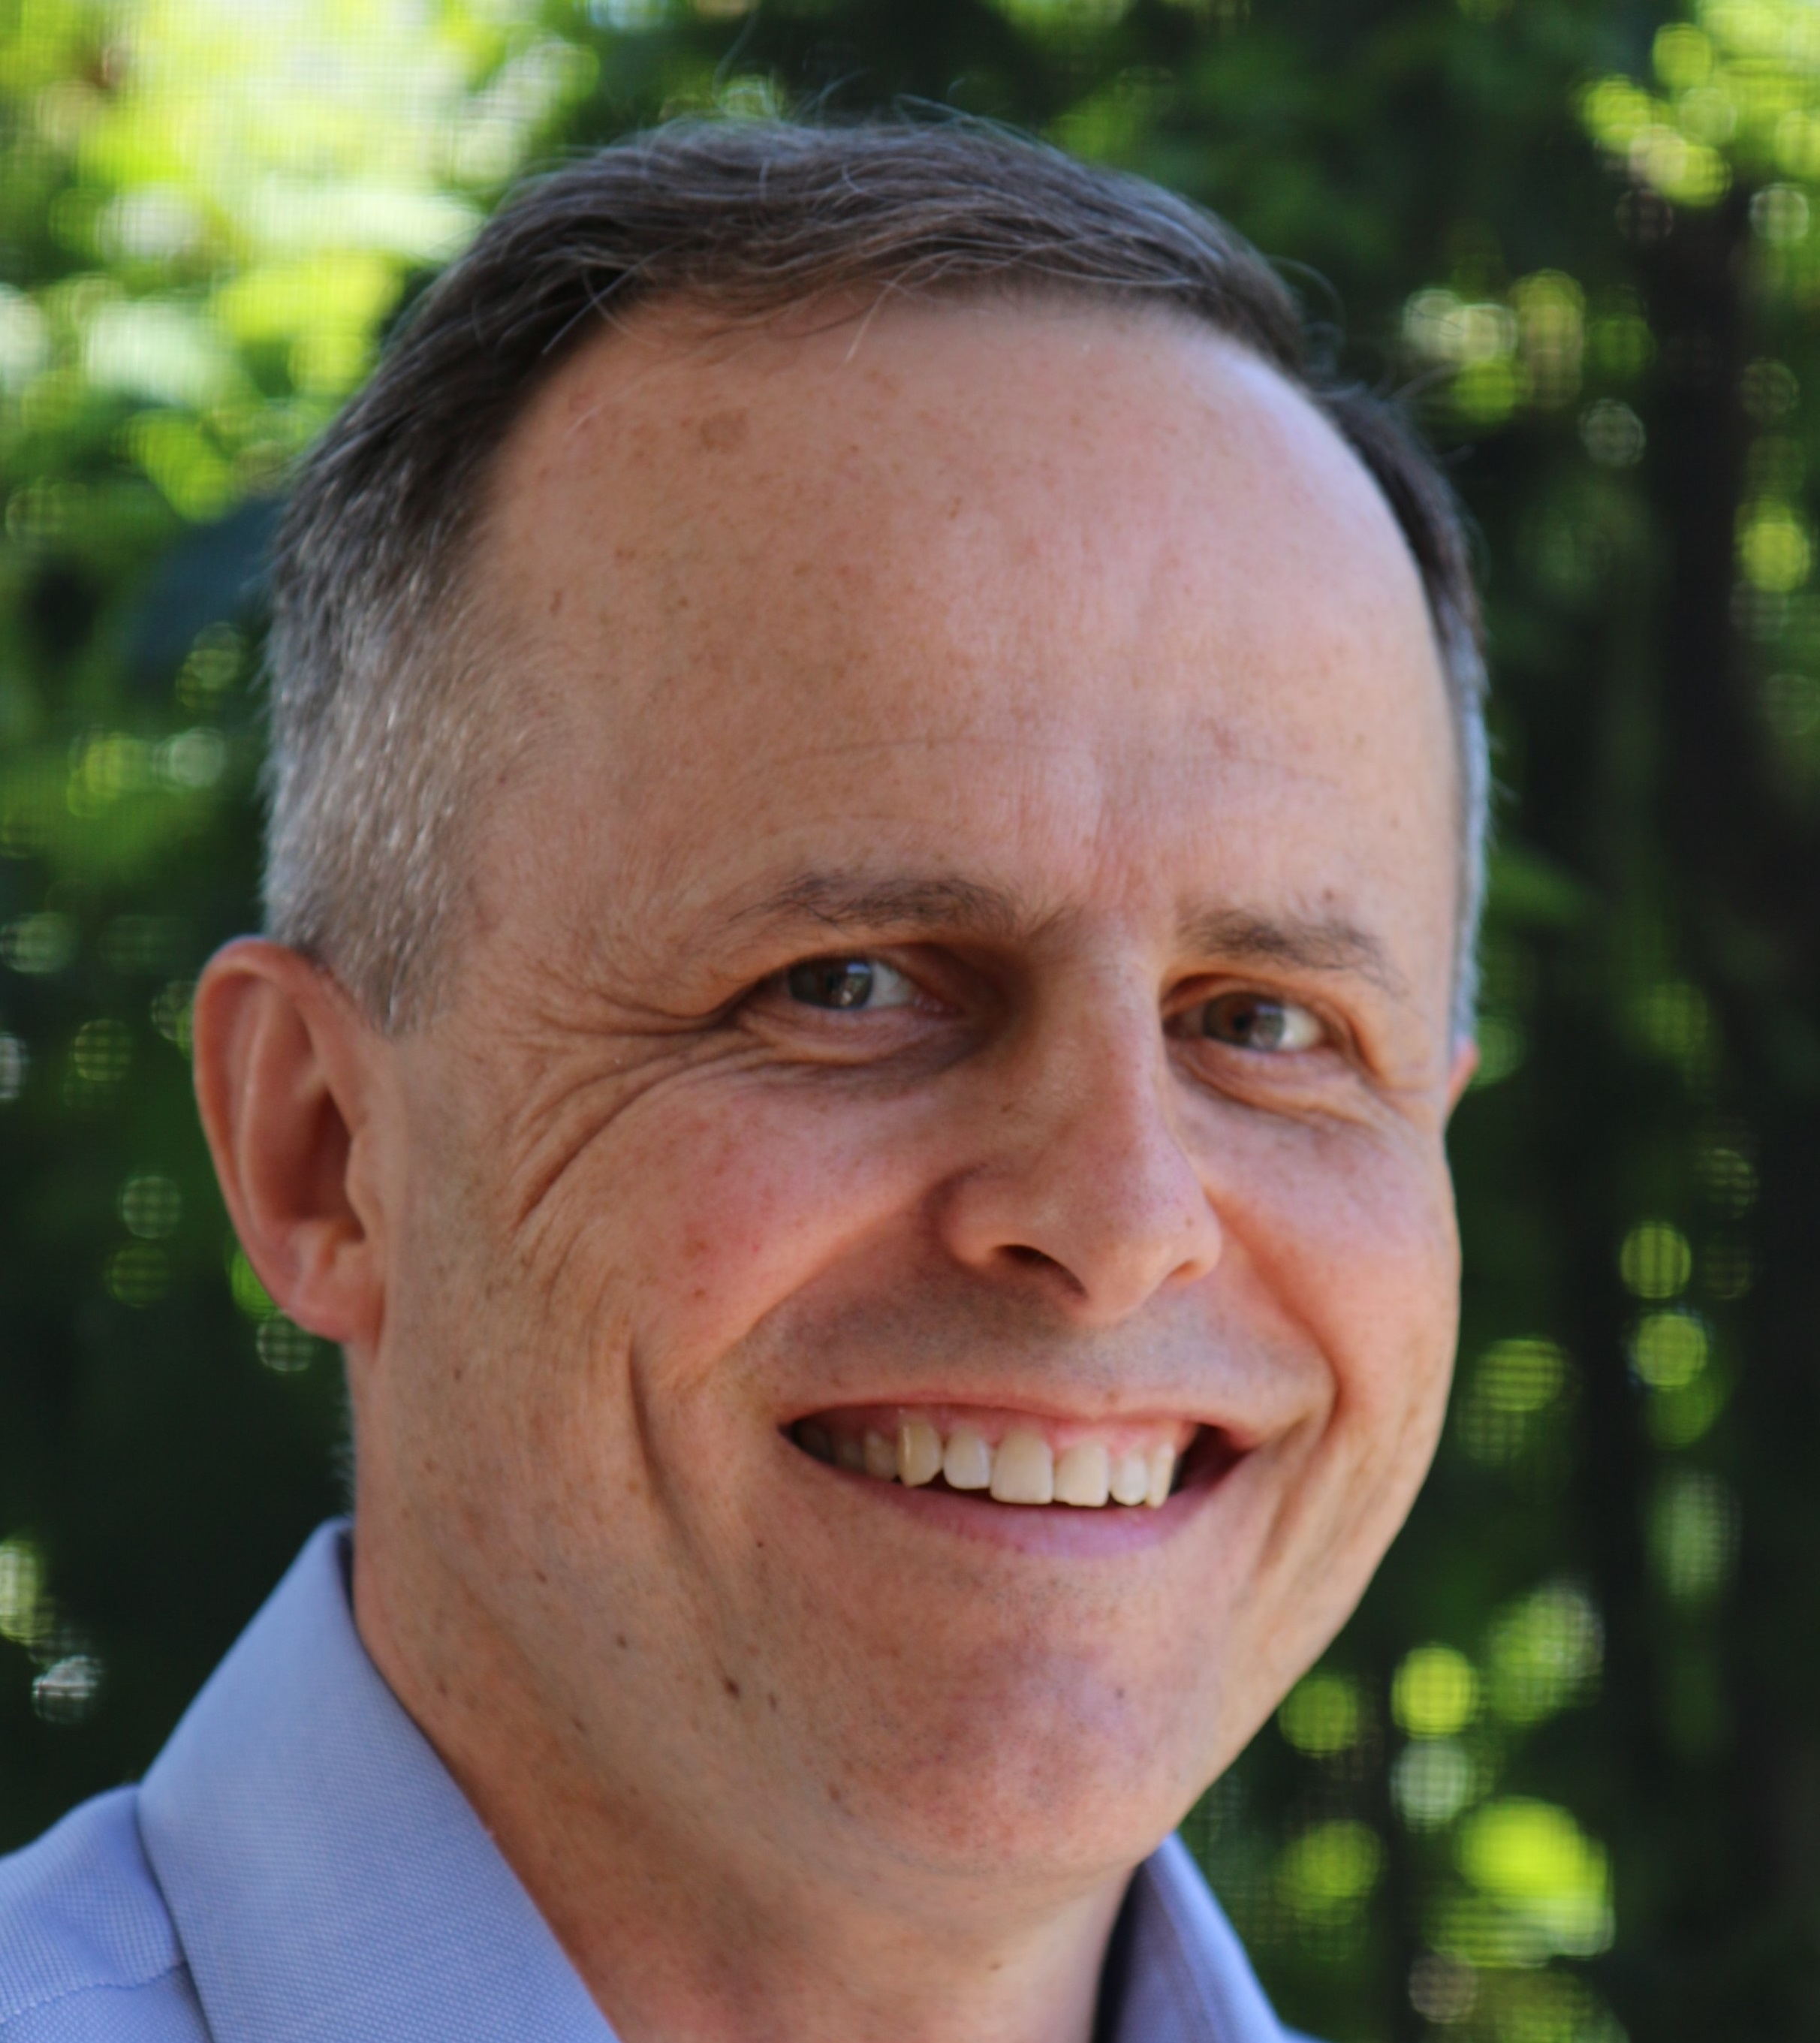 Philippe Brianceau, DVM